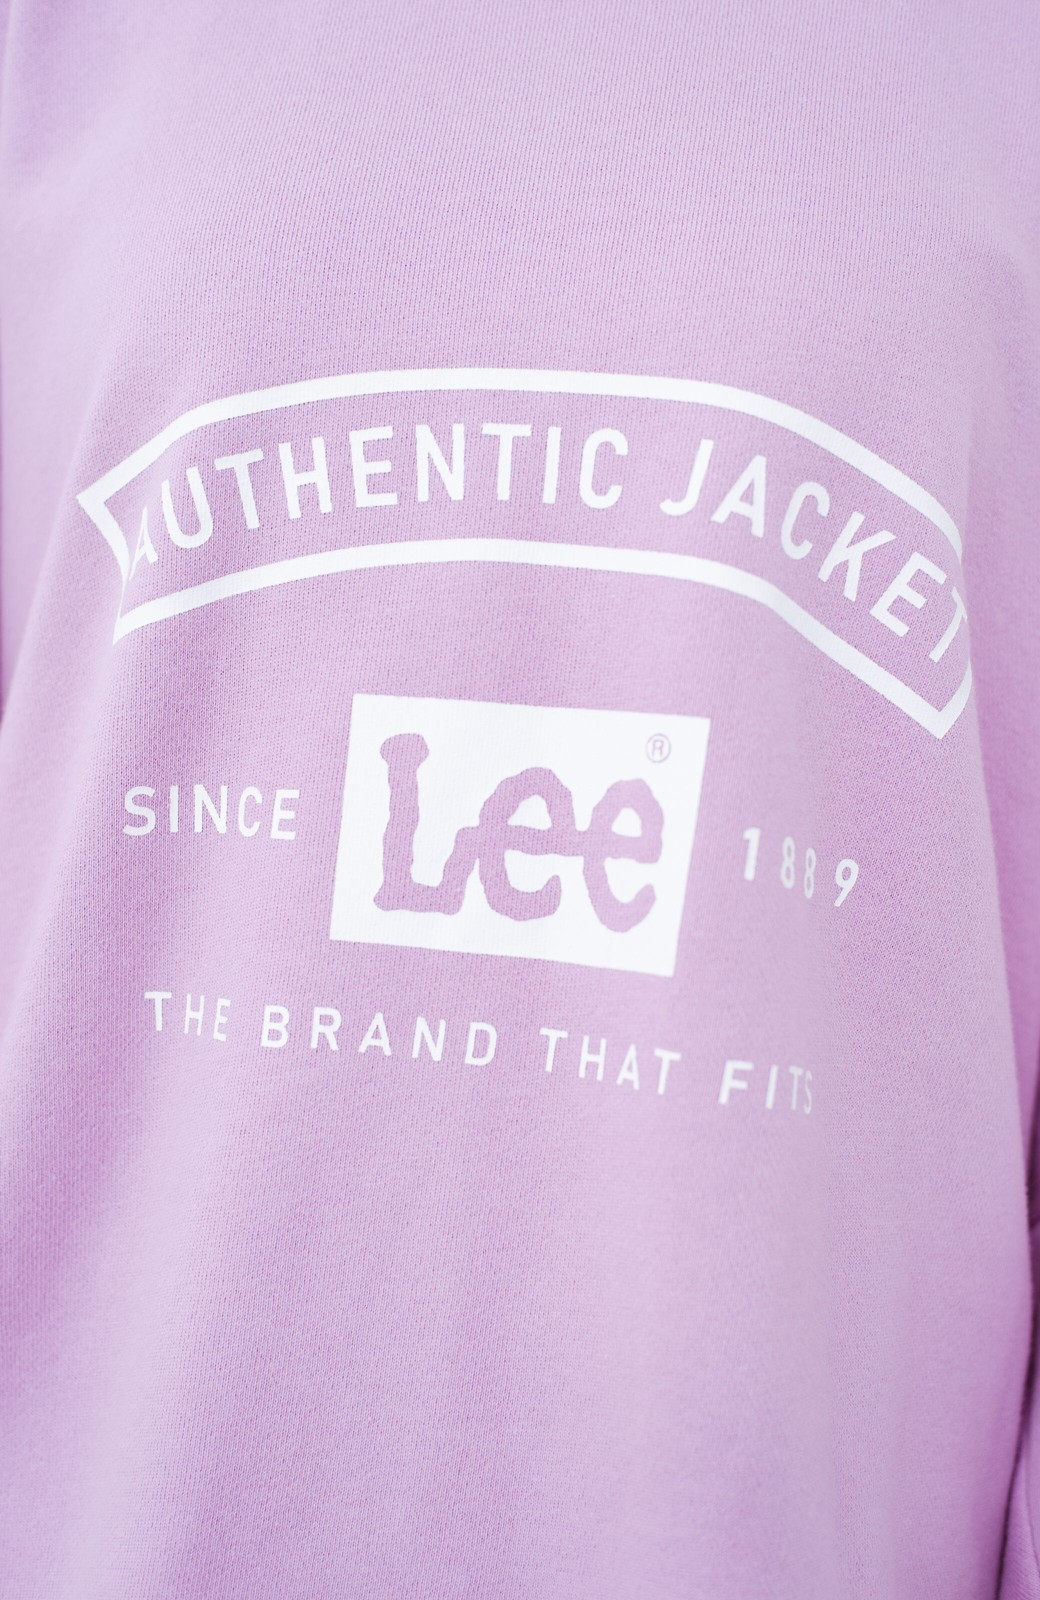 haco! Lady Lee メンズライクなだぼっとサイズ マカロンカラーが可愛いプルオーバー <ラベンダー>の商品写真3